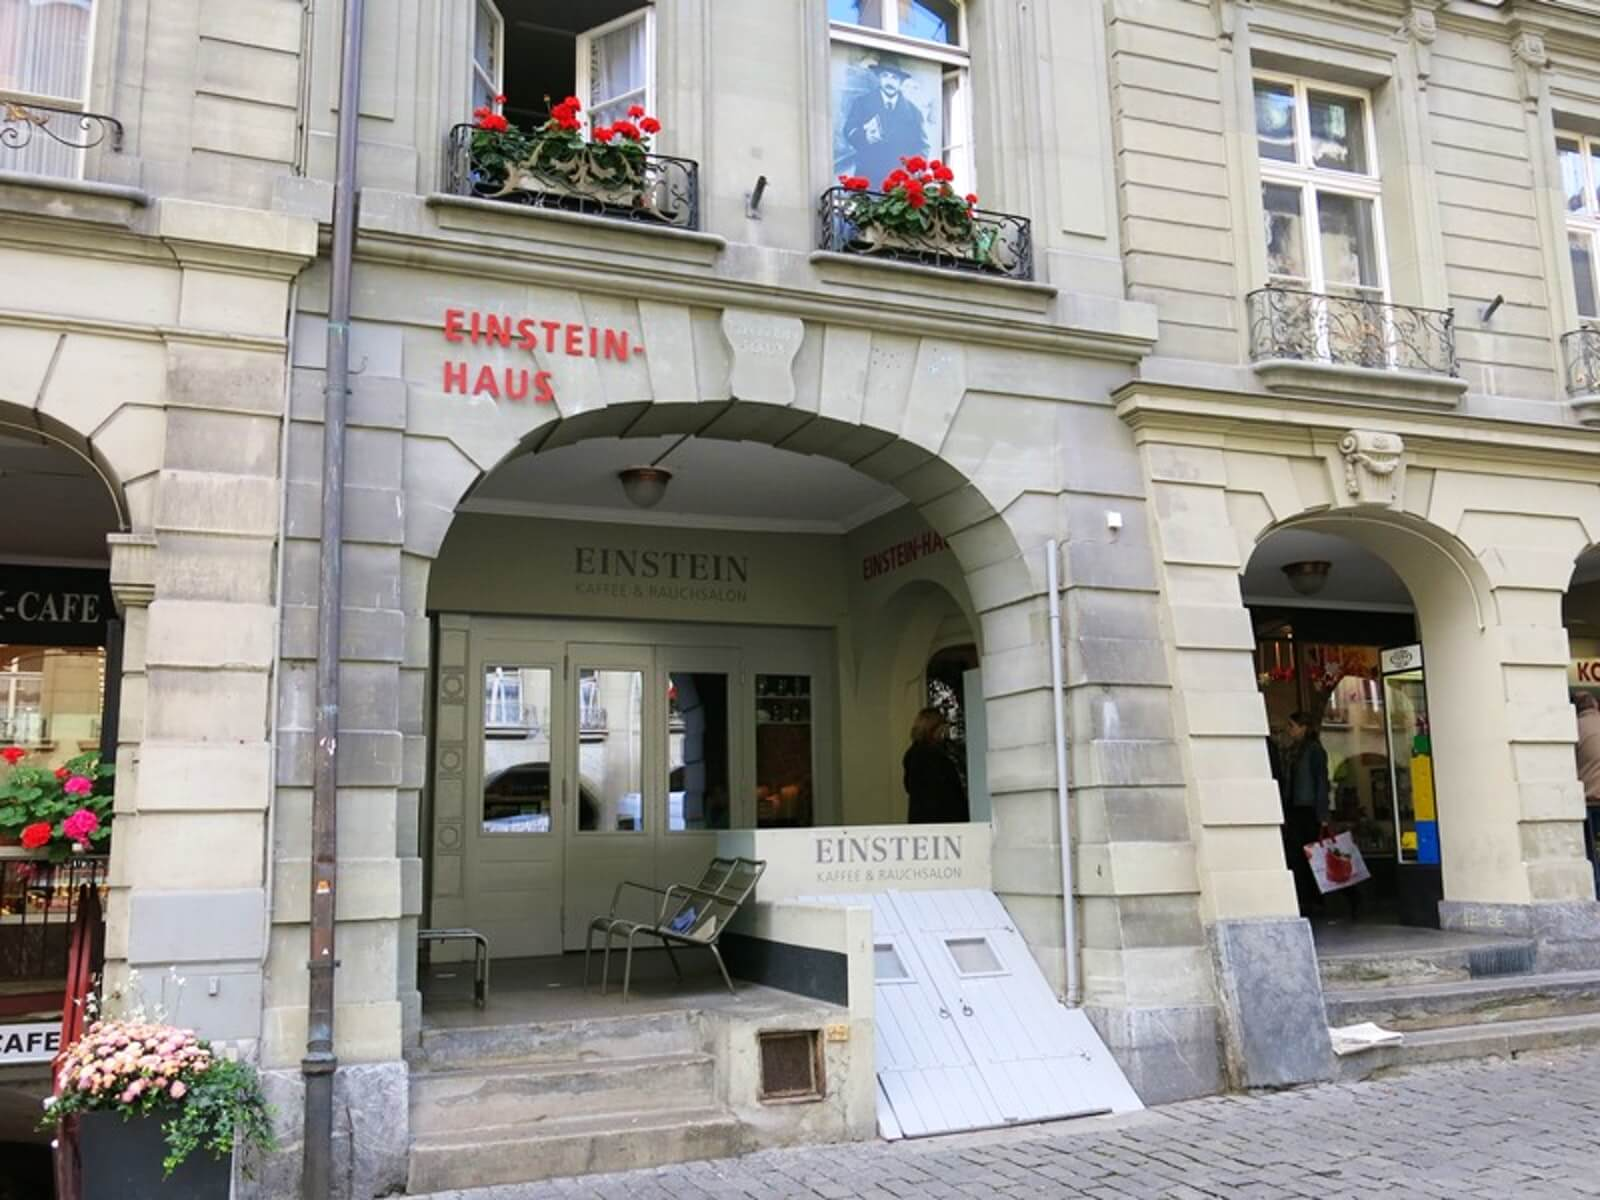 Дом-музей Эйнштейна